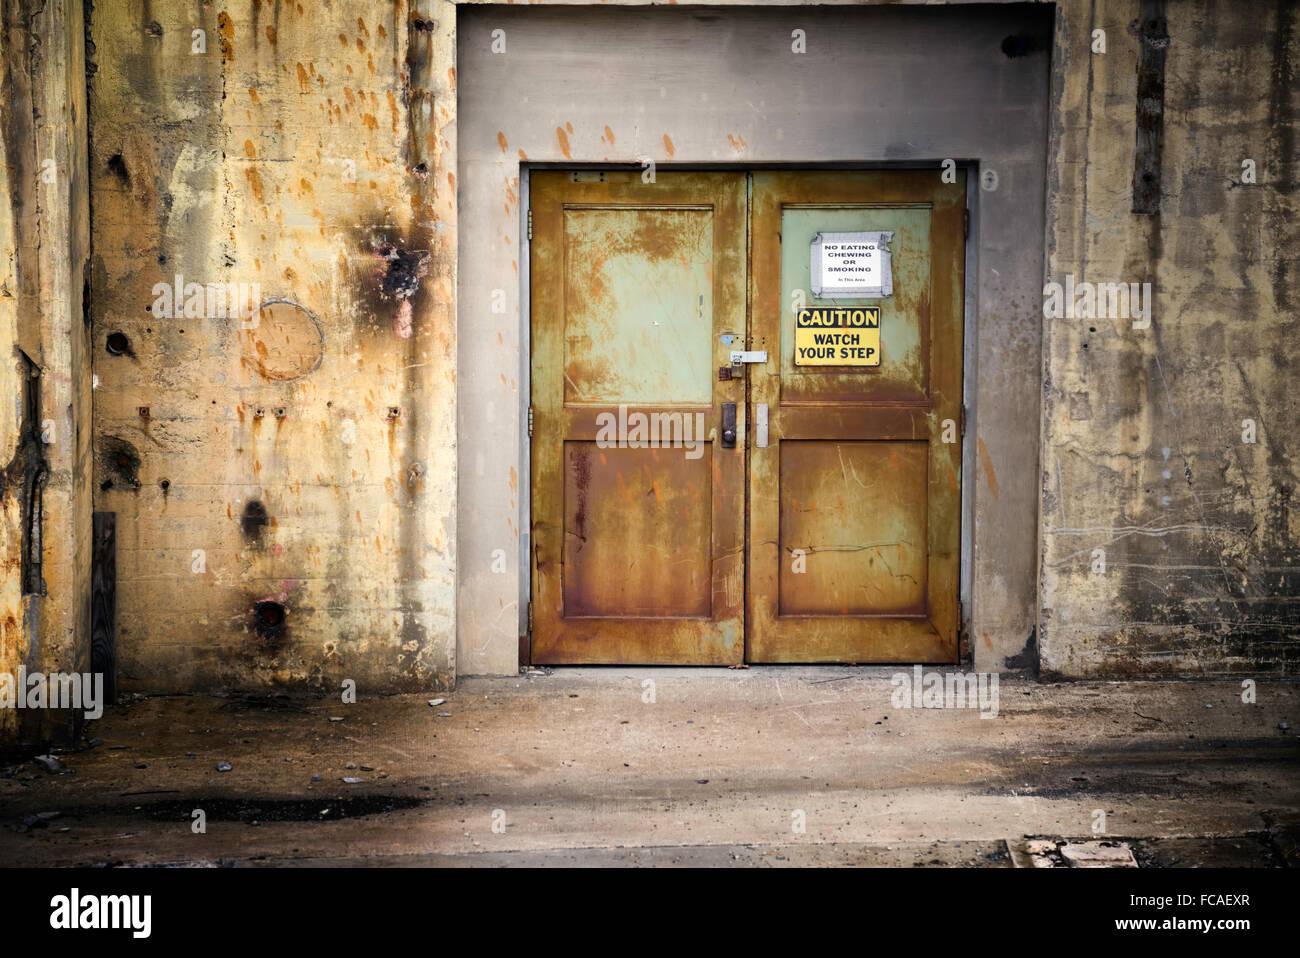 Vieux métal portes industrielles croûté à Reynolds Tobacco Bailey. Winston Salem, NC Photo Stock